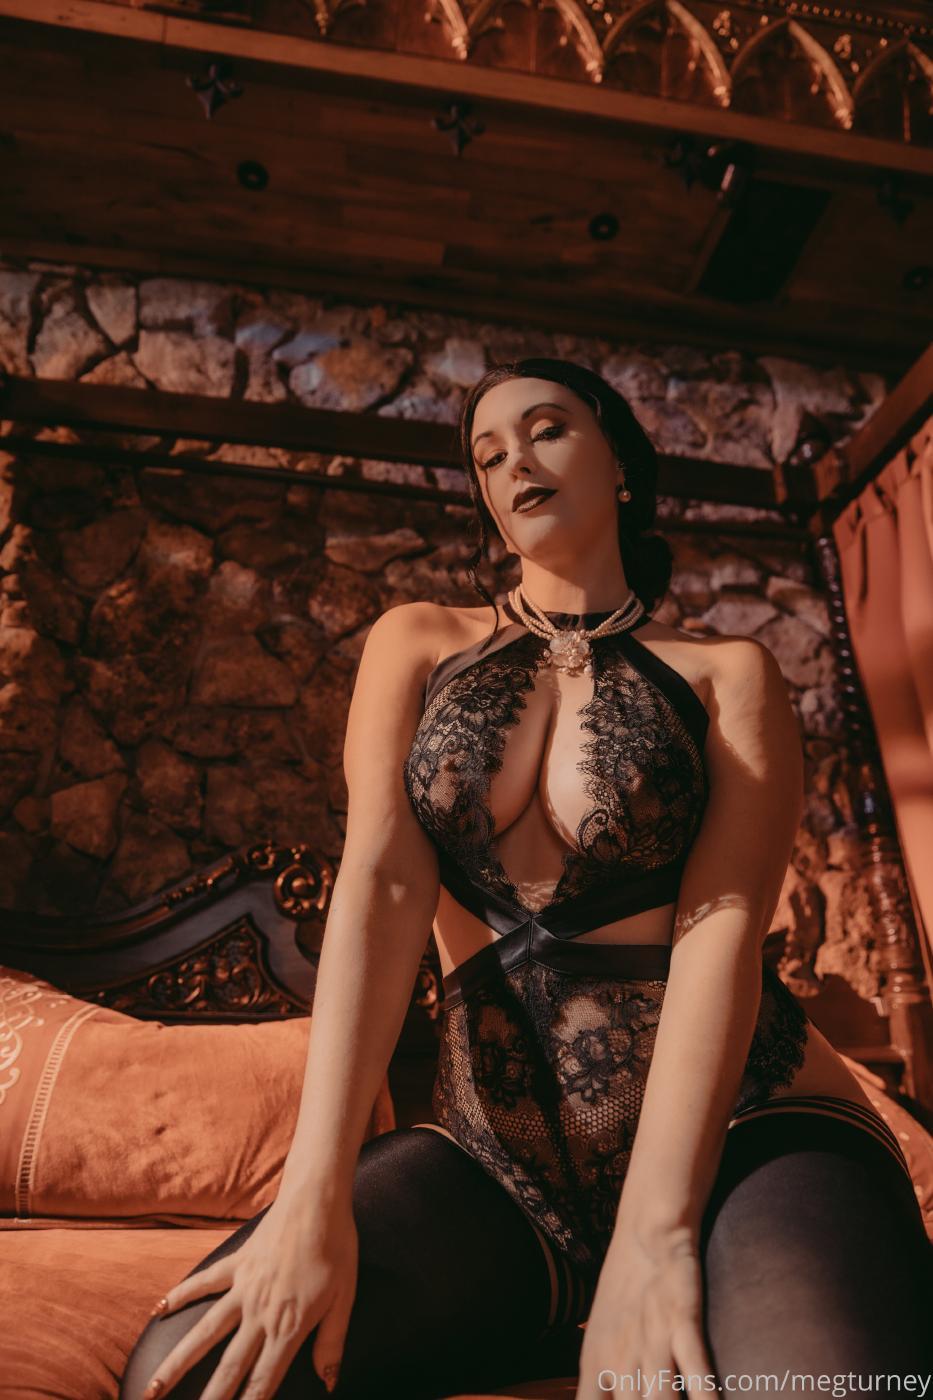 Meg Turney Lady Dimitrescu Cosplay Onlyfans Set Leaked 0046